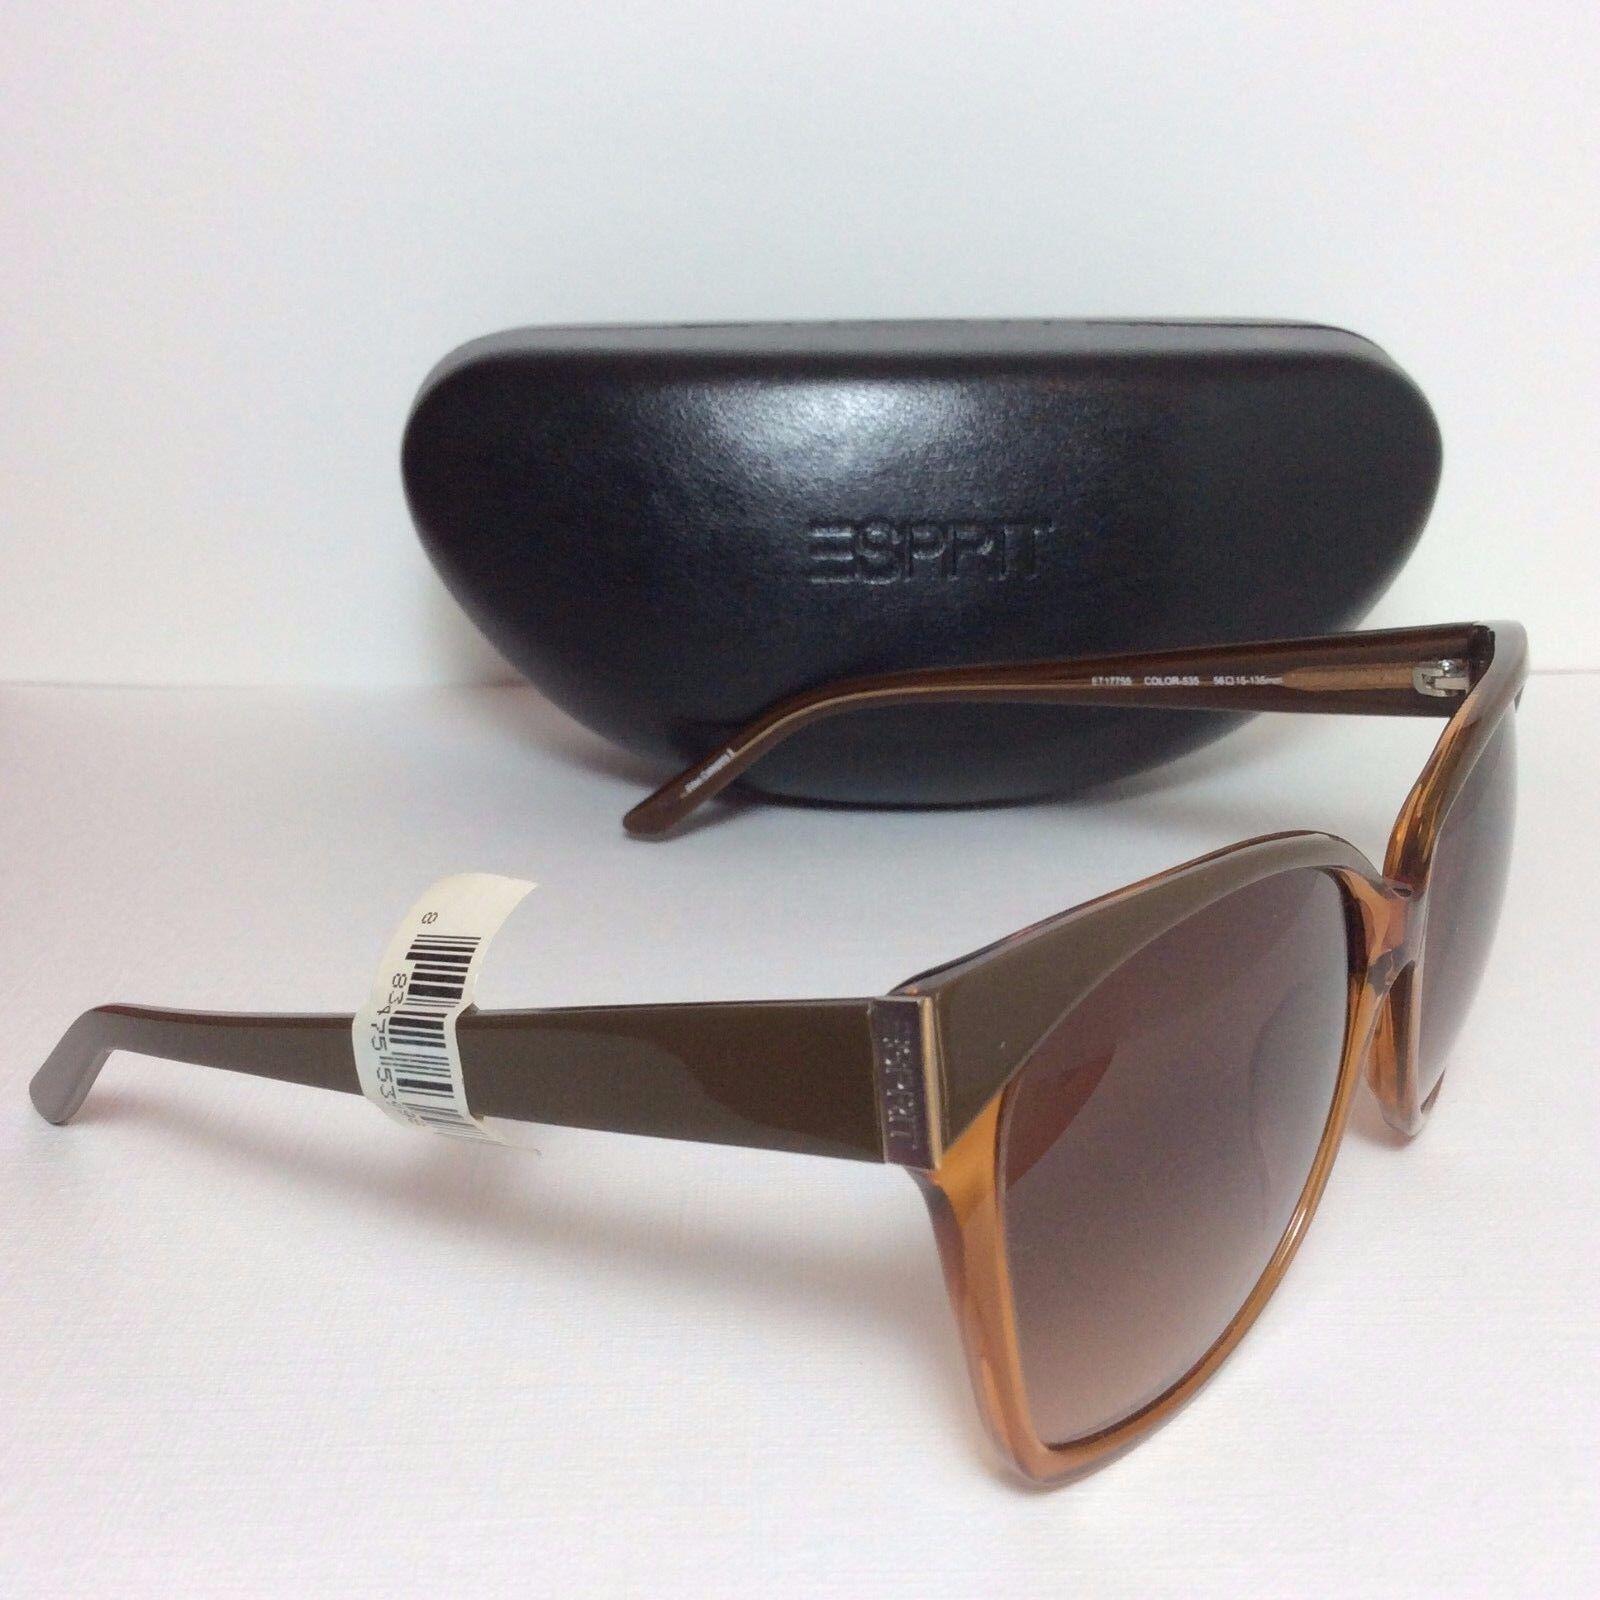 e6ed4c0e2a3 Esprit Eyewear Et17755 535 56 135 Brown Frame for Women for sale ...